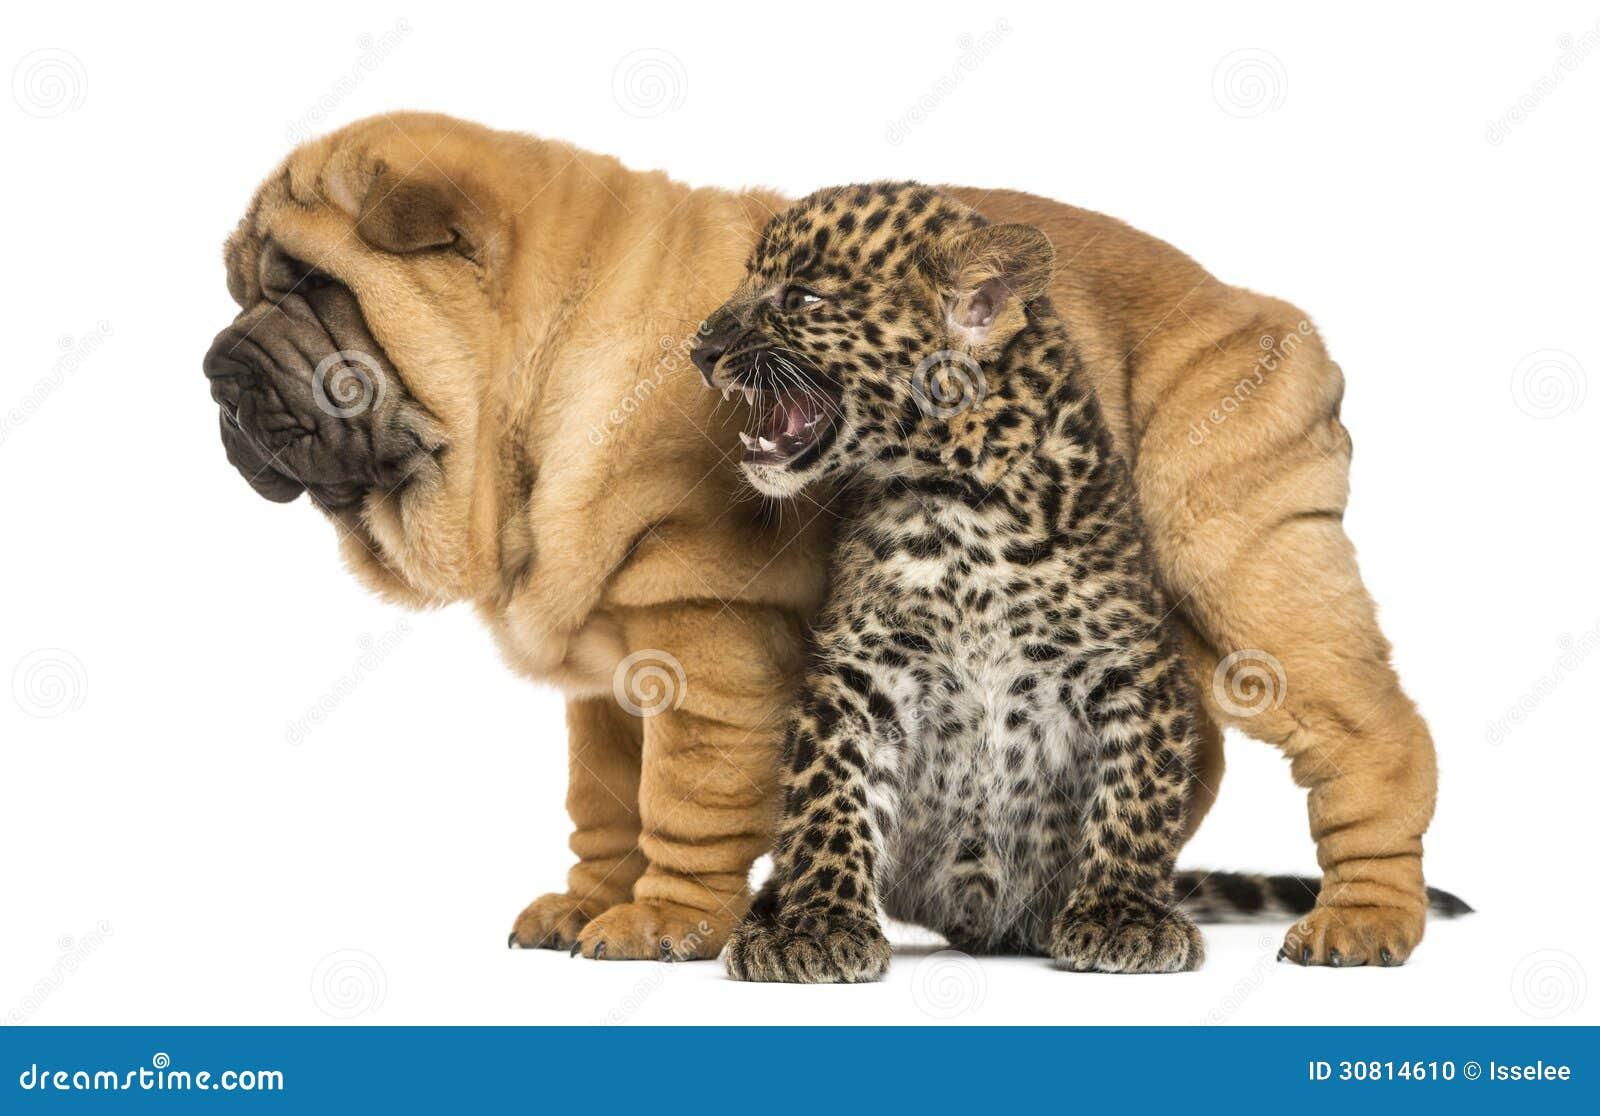 How To Check Labrador Dog Breed